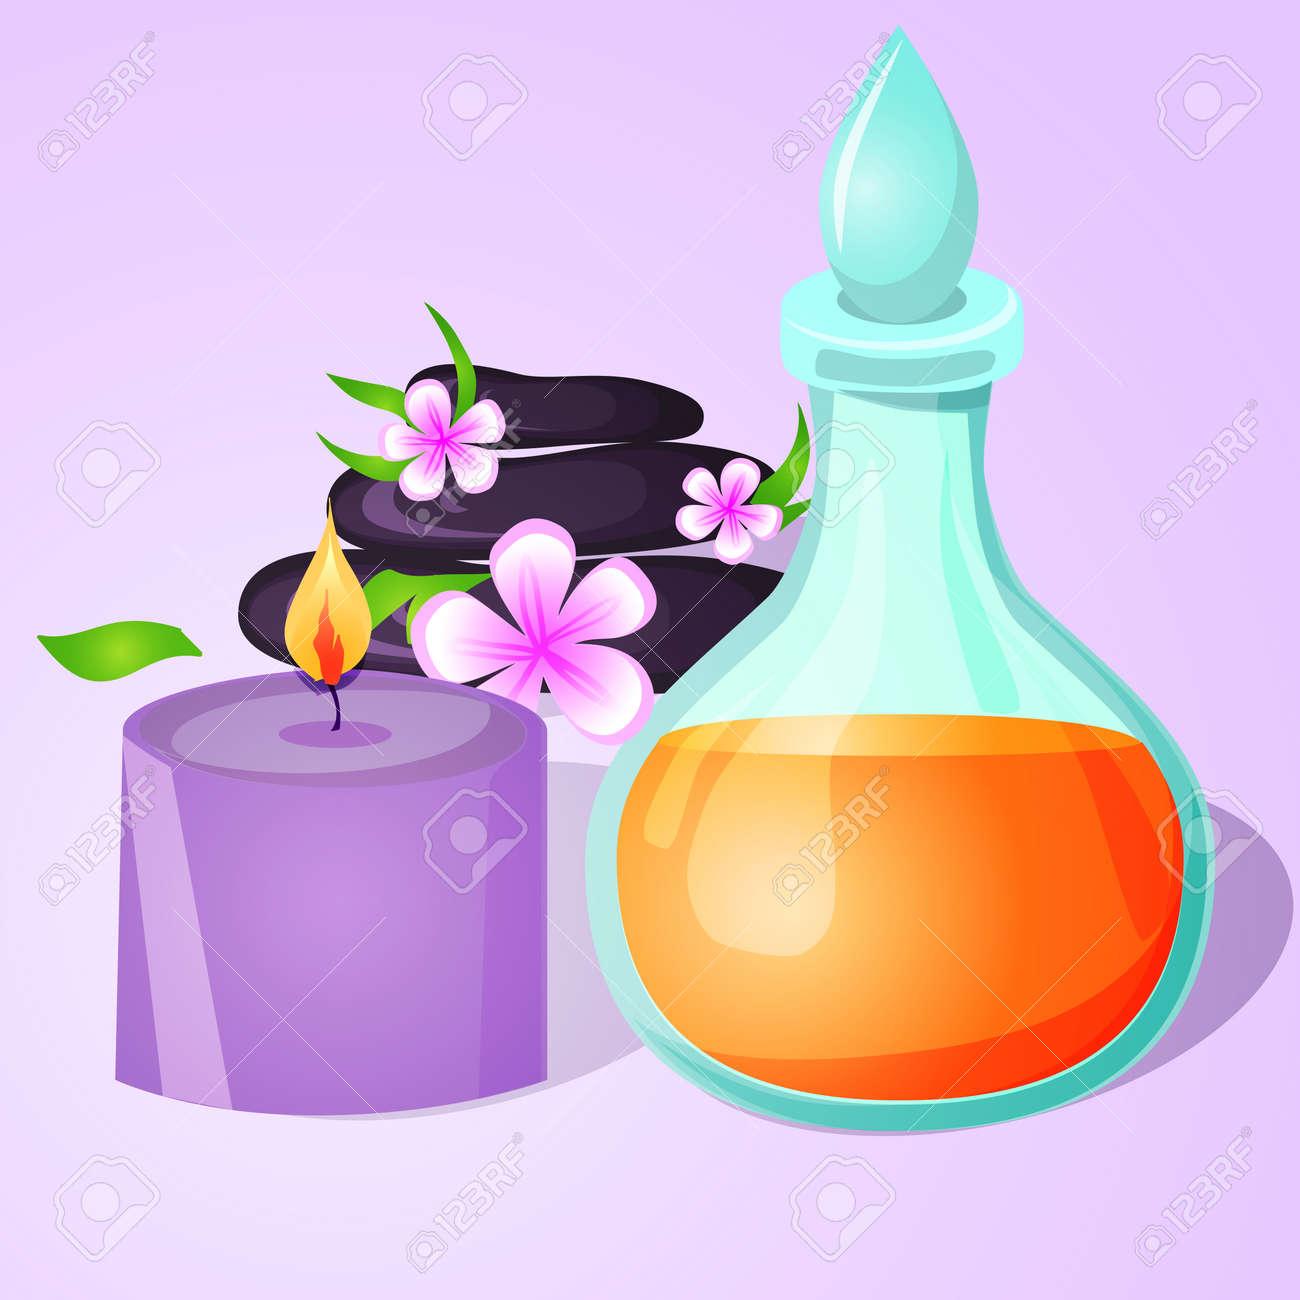 Towel and aroma oil symbols symbols cartoon icons design for towel and aroma oil symbols symbols cartoon icons design for cosmetics store buycottarizona